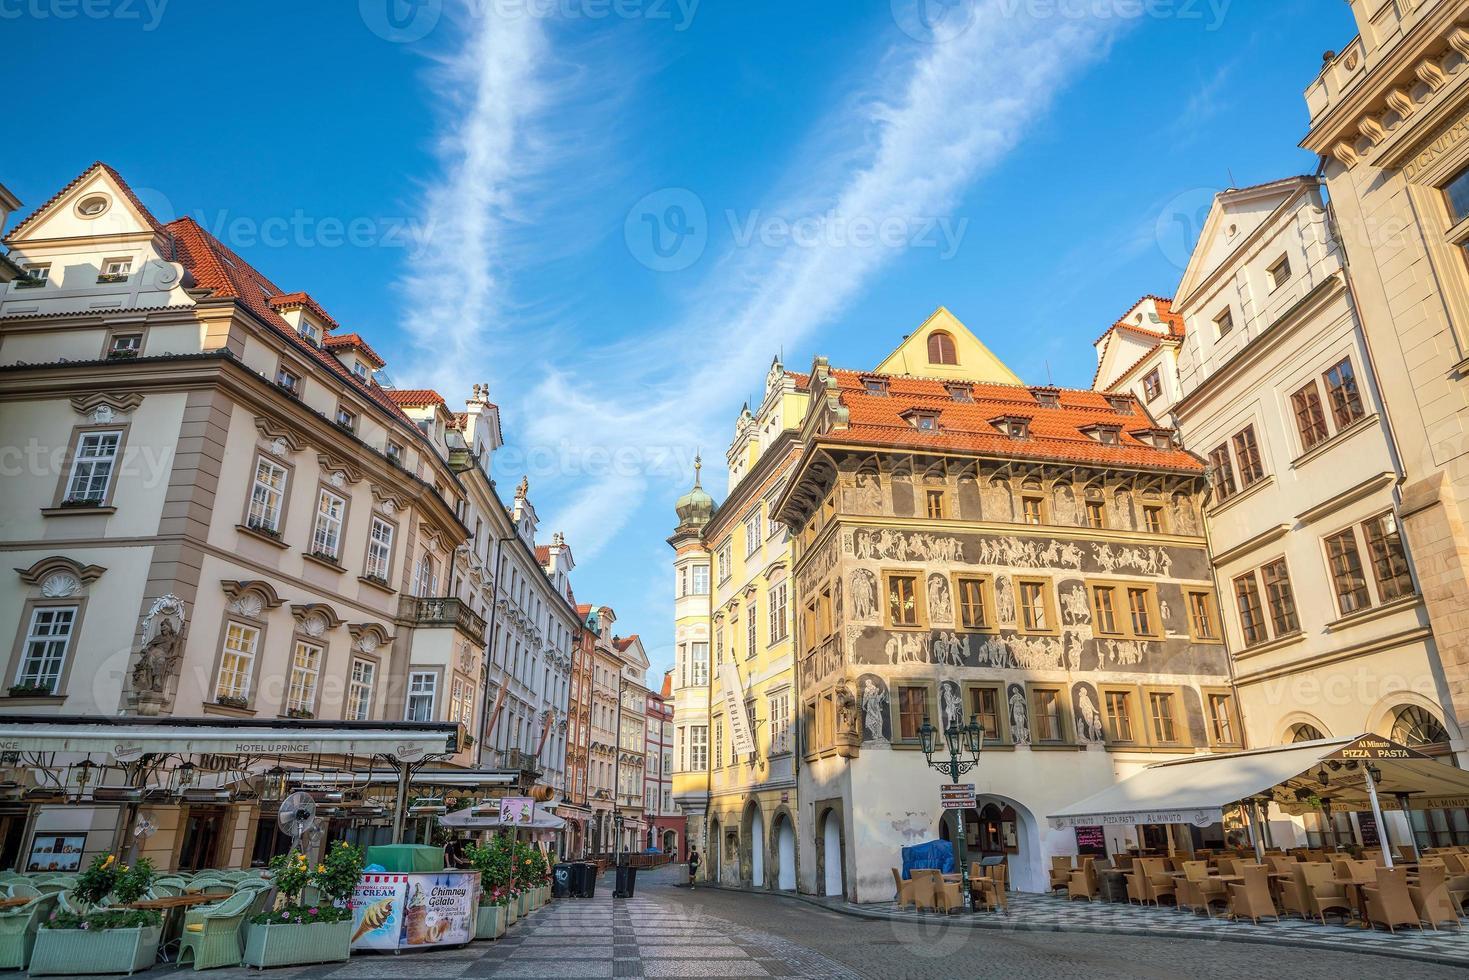 erfgoedgebouwen in de oude binnenstad van Praag in Tsjechië foto